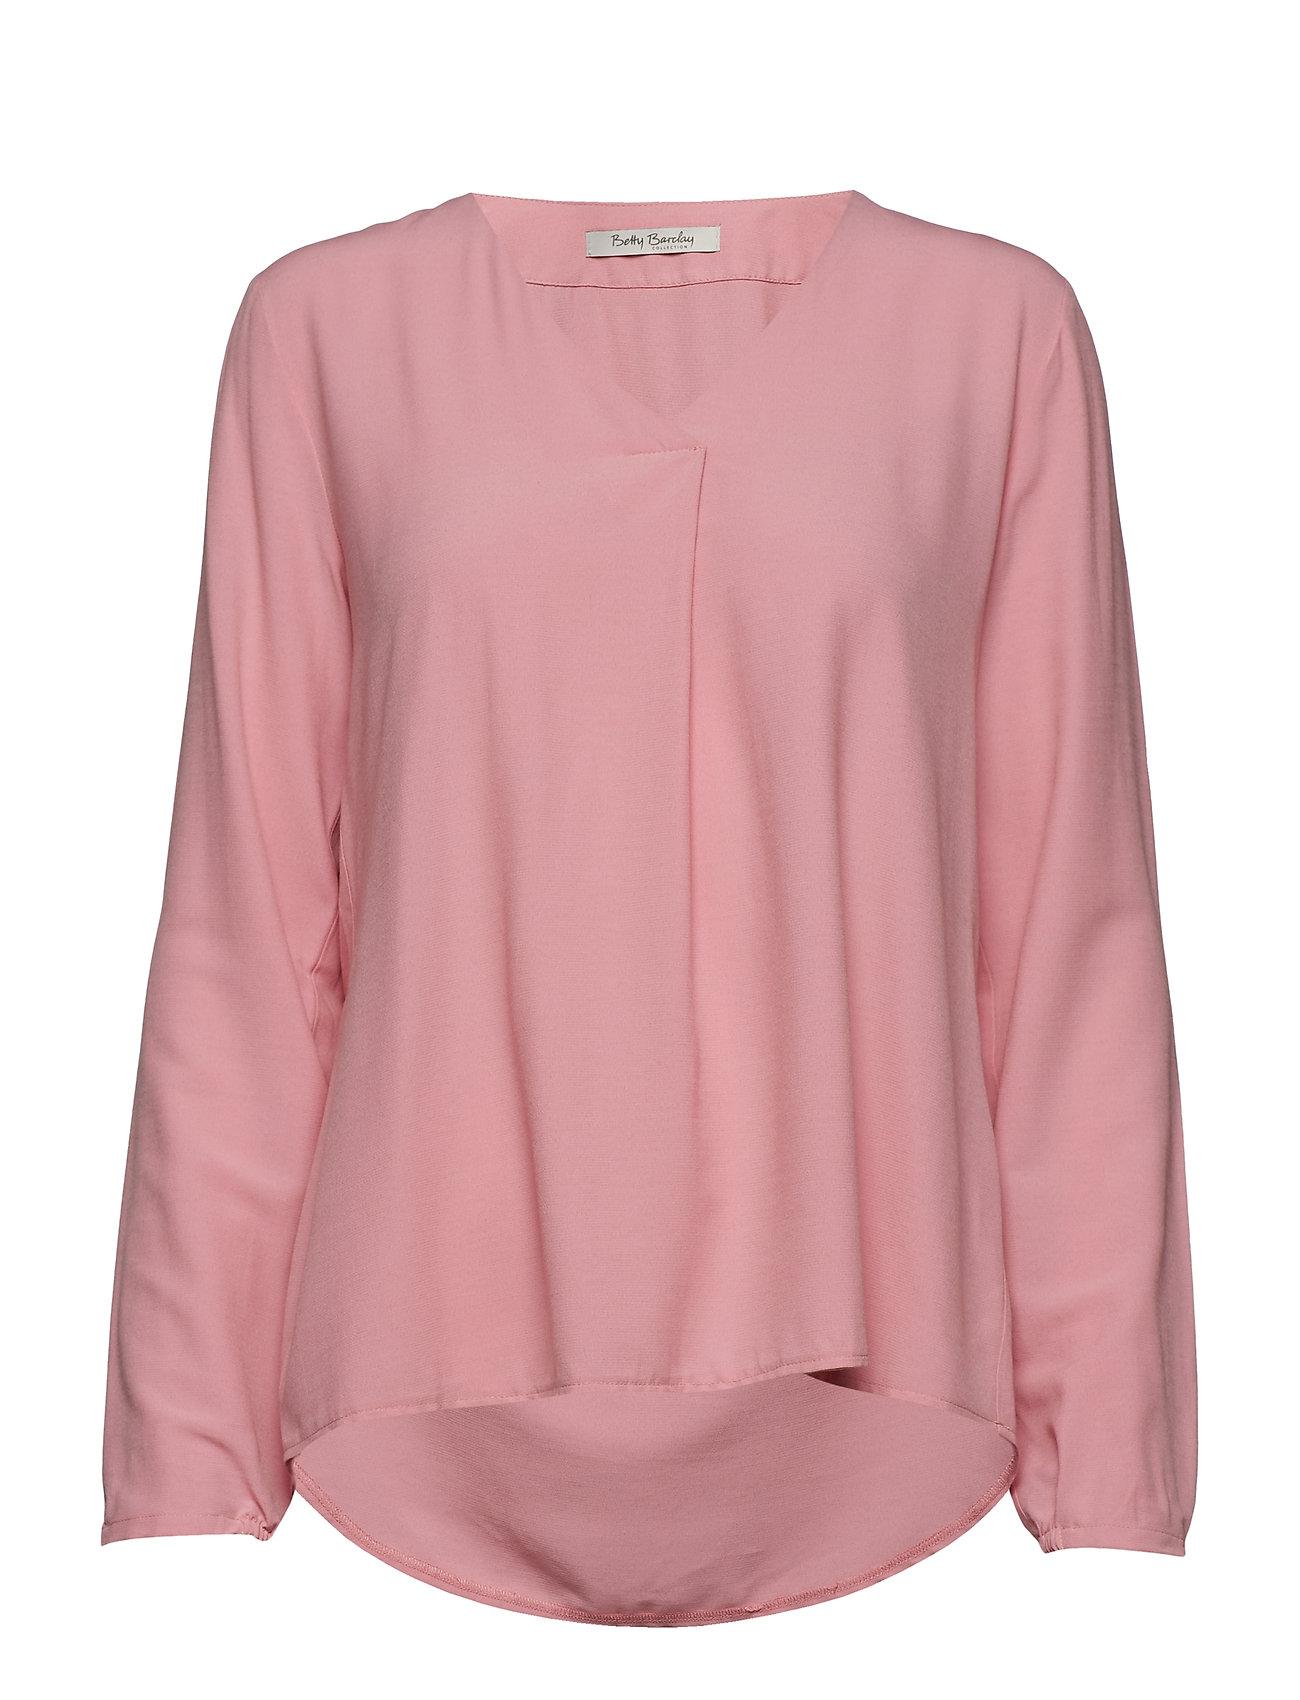 Betty Barclay blouse - SEA PINK